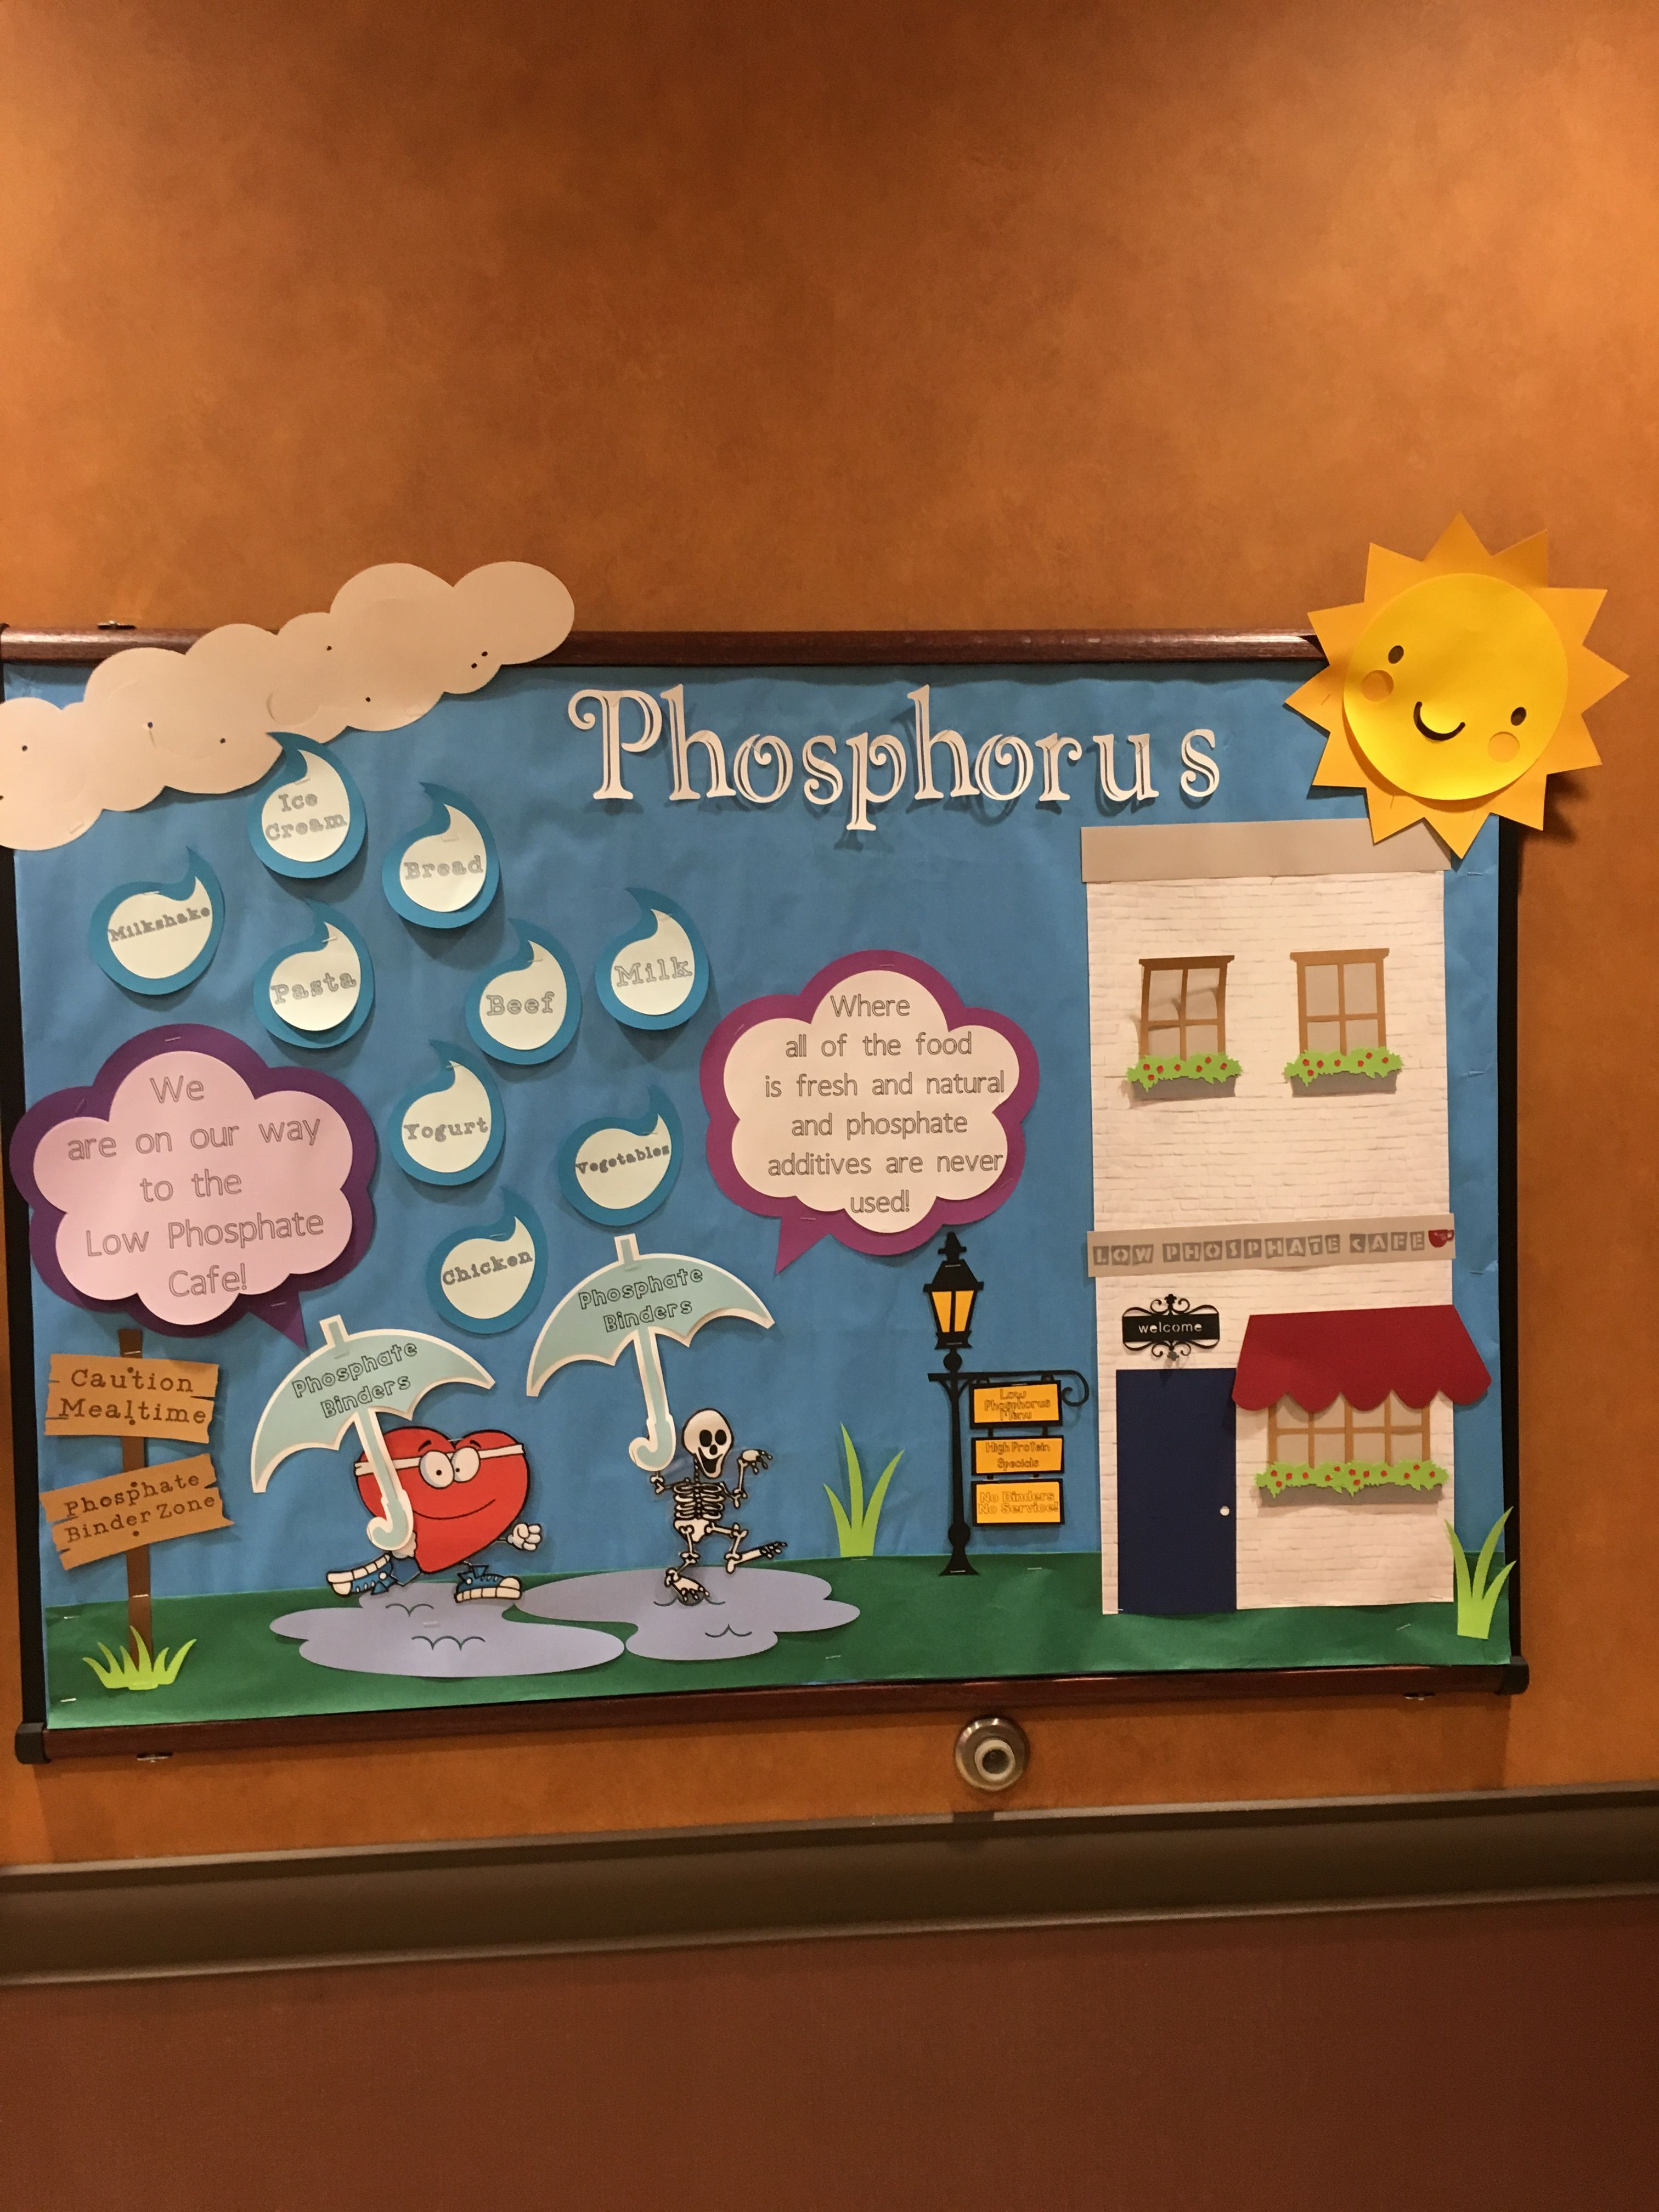 office bulletin board ideas pinterest. Phosphorus Cafe Bb Office Bulletin Board Ideas Pinterest